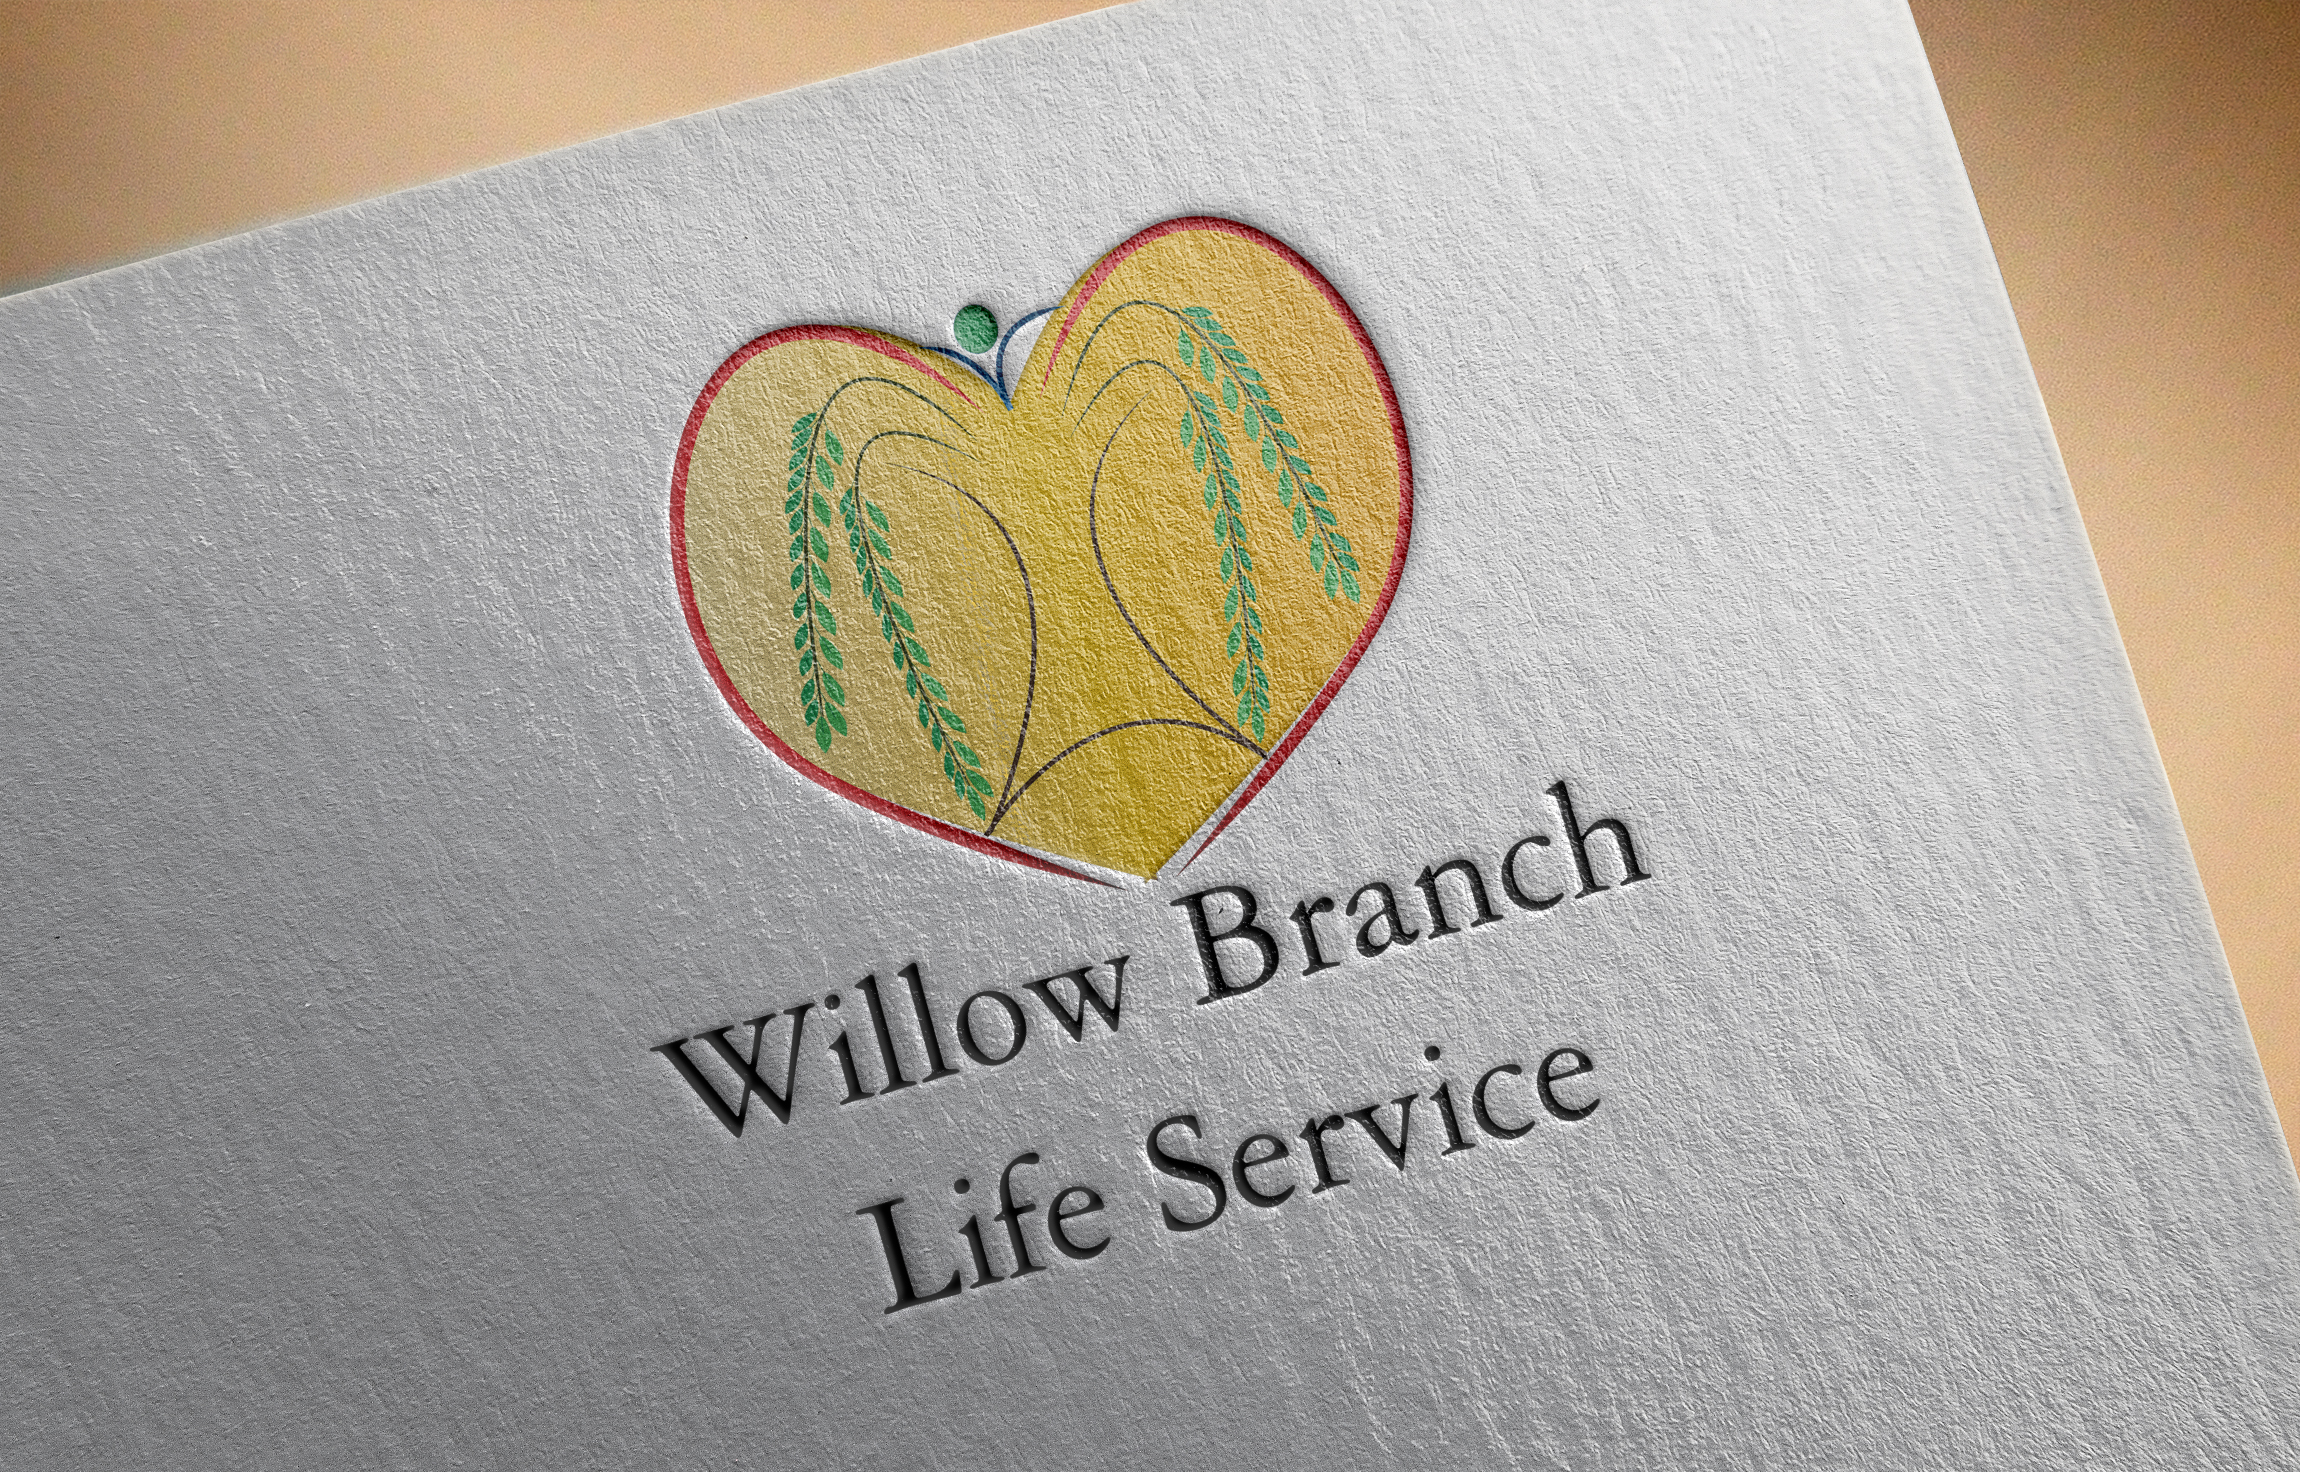 Logo Design by Goran Ledjenovic - Entry No. 53 in the Logo Design Contest Artistic Logo Design for Willow Branch Life Service.